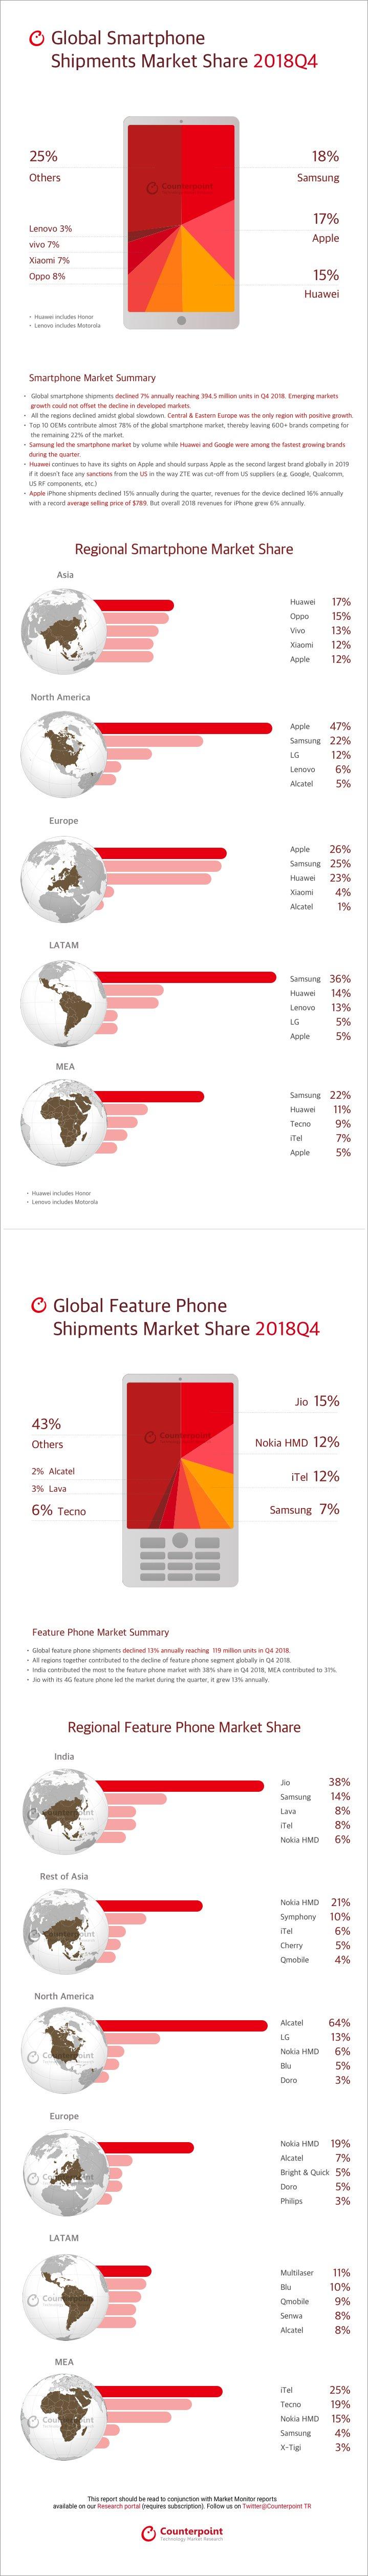 Infographic 2018_Q4